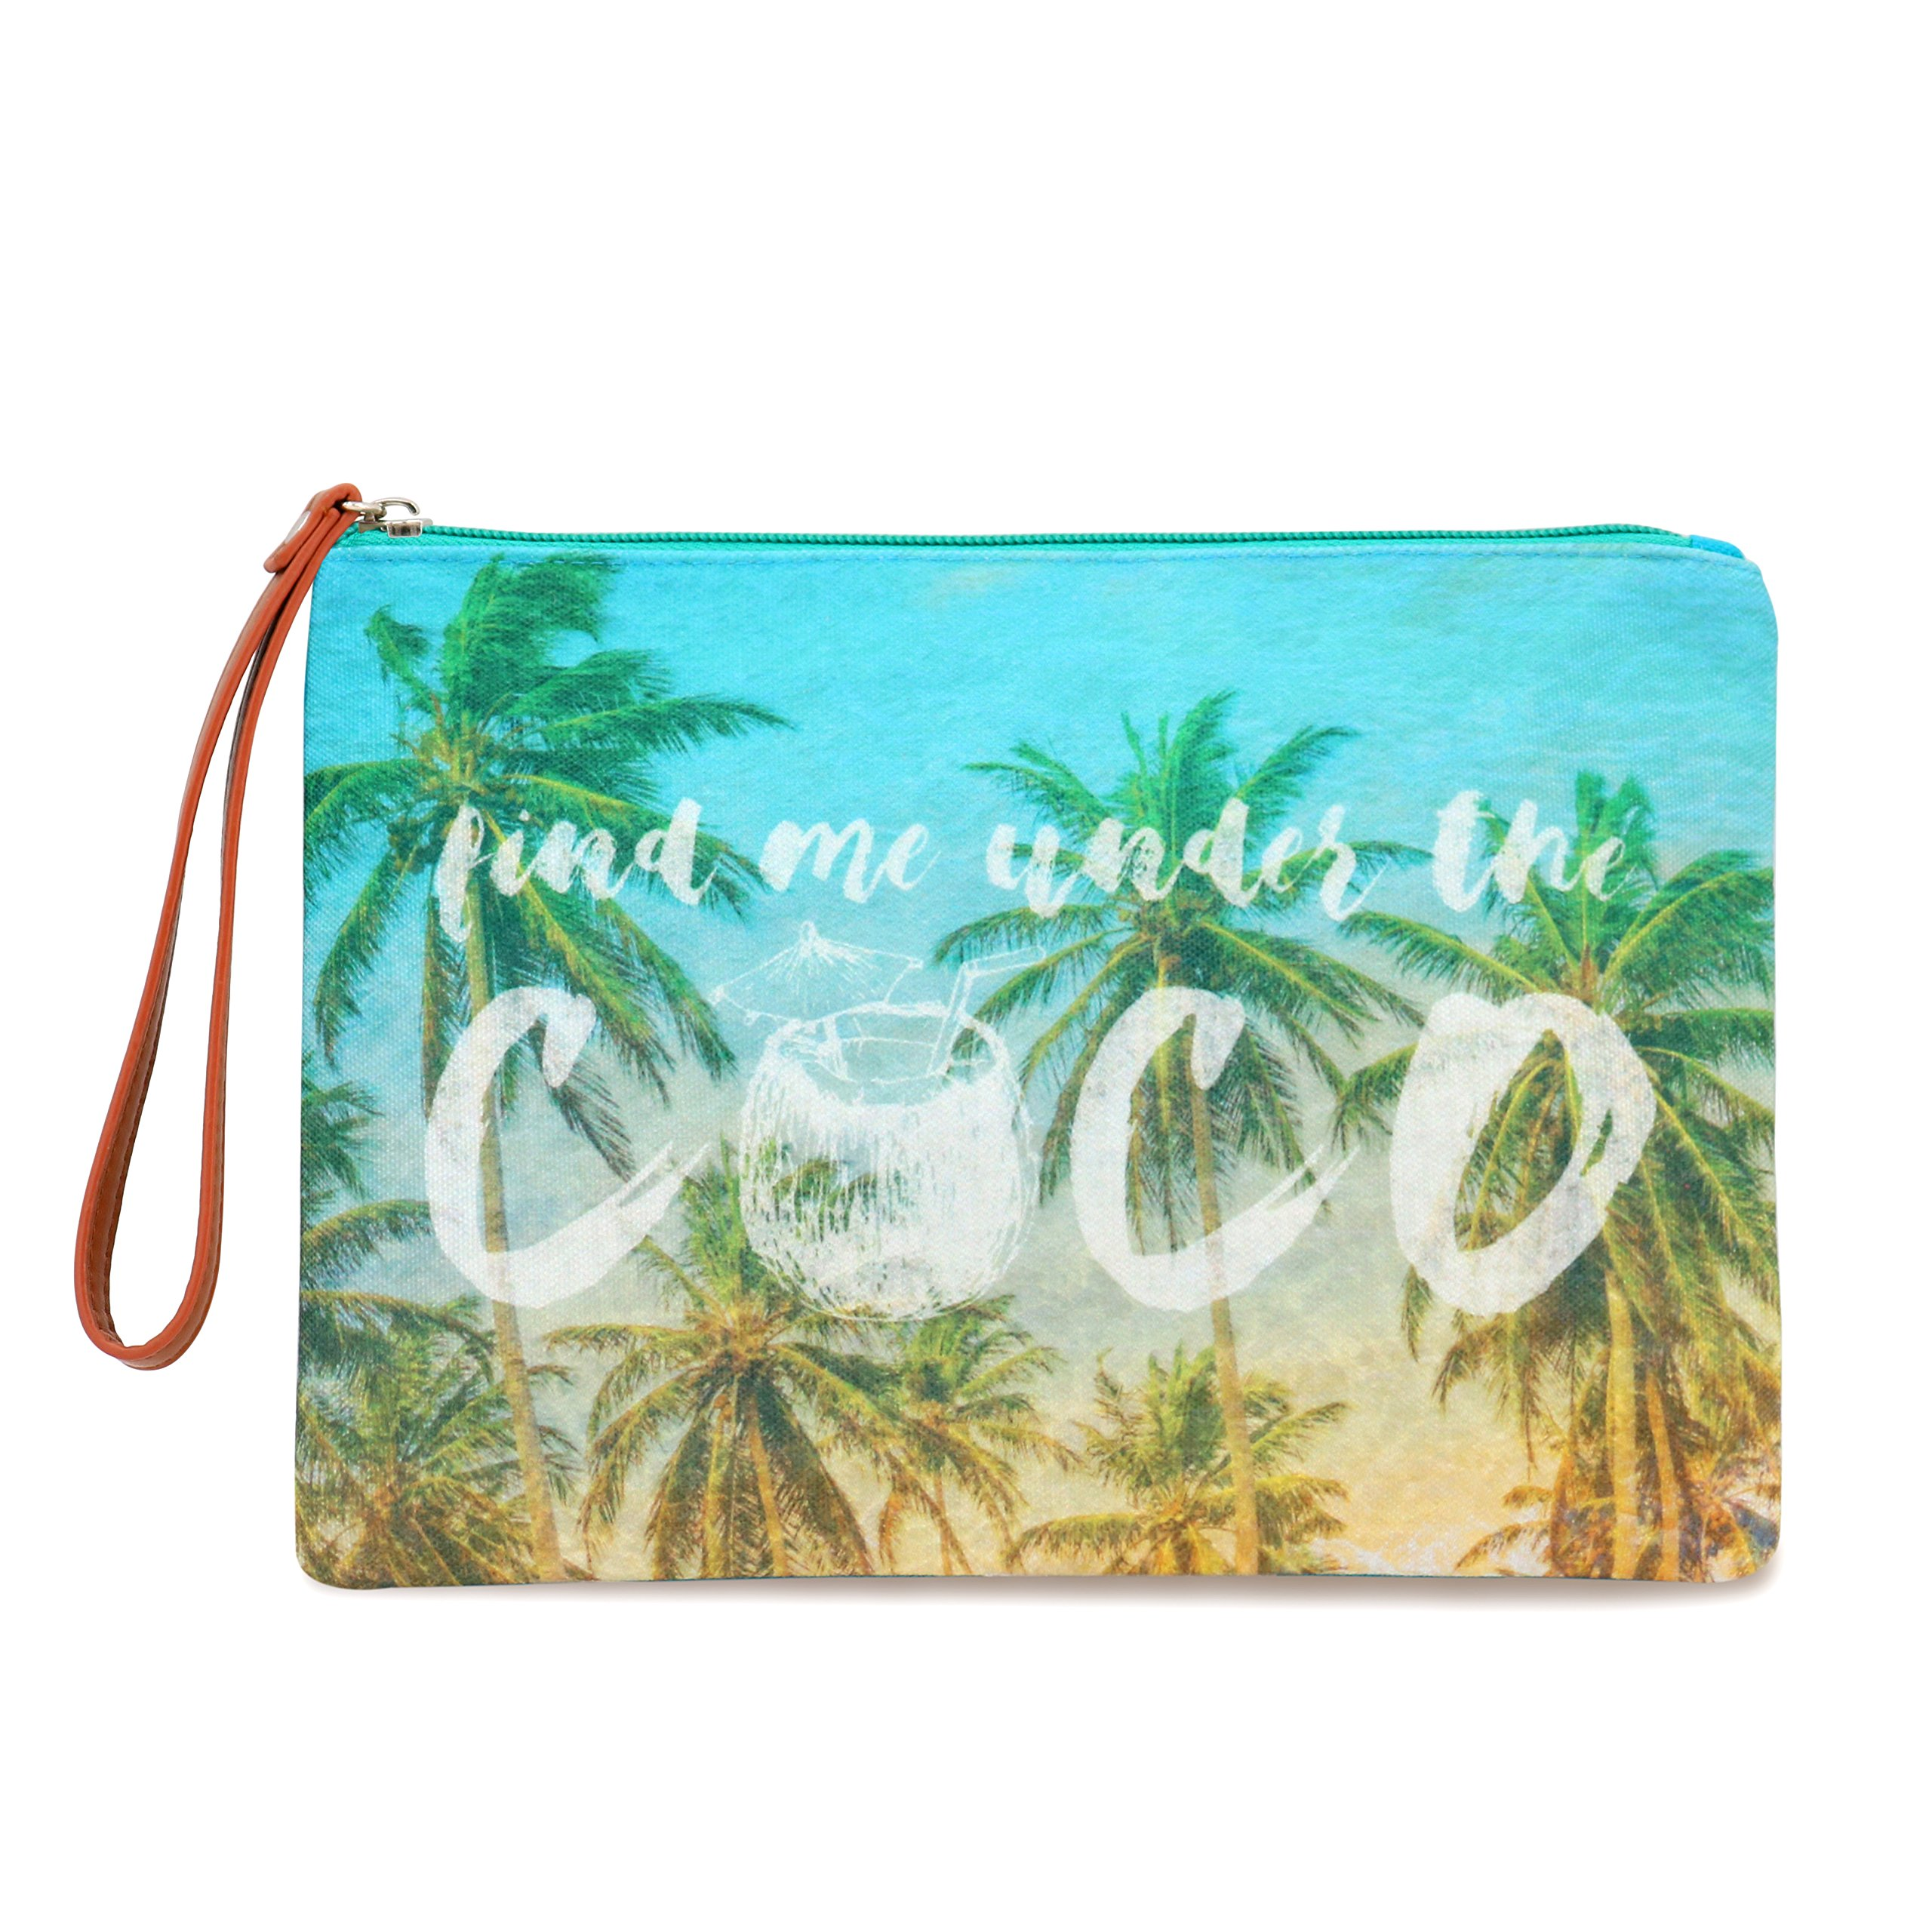 Seven Island Women Leather Canvas Cute Tropical Pineapple Print Unisex Portable Travel Evening Cosmetic Makeup Zipper Purse Wrist Pouch Clutch